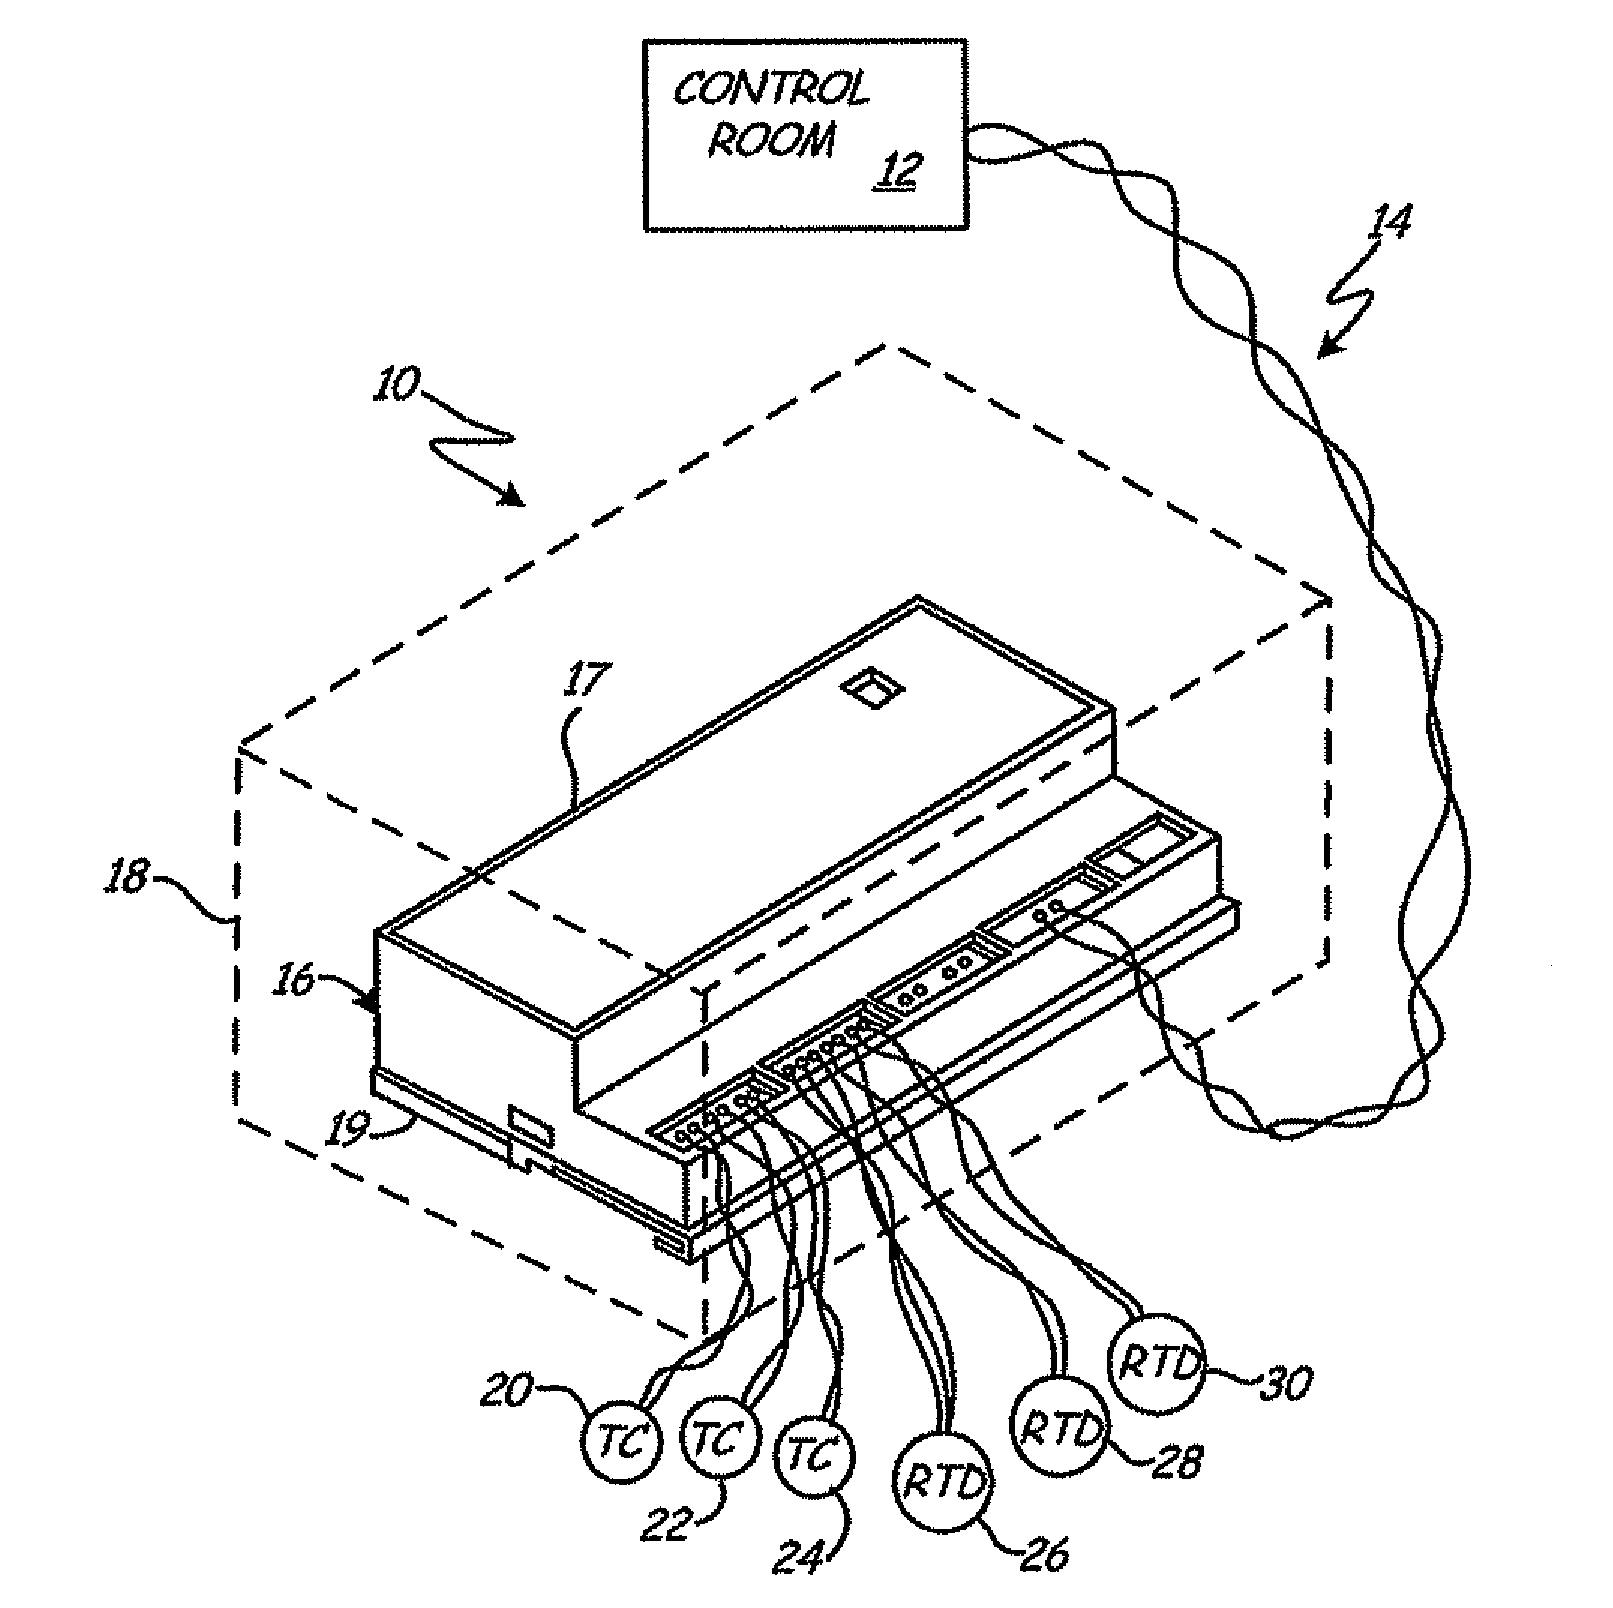 hight resolution of ke control wiring diagram online diagramwiring controller installation diagram7 pin trailer